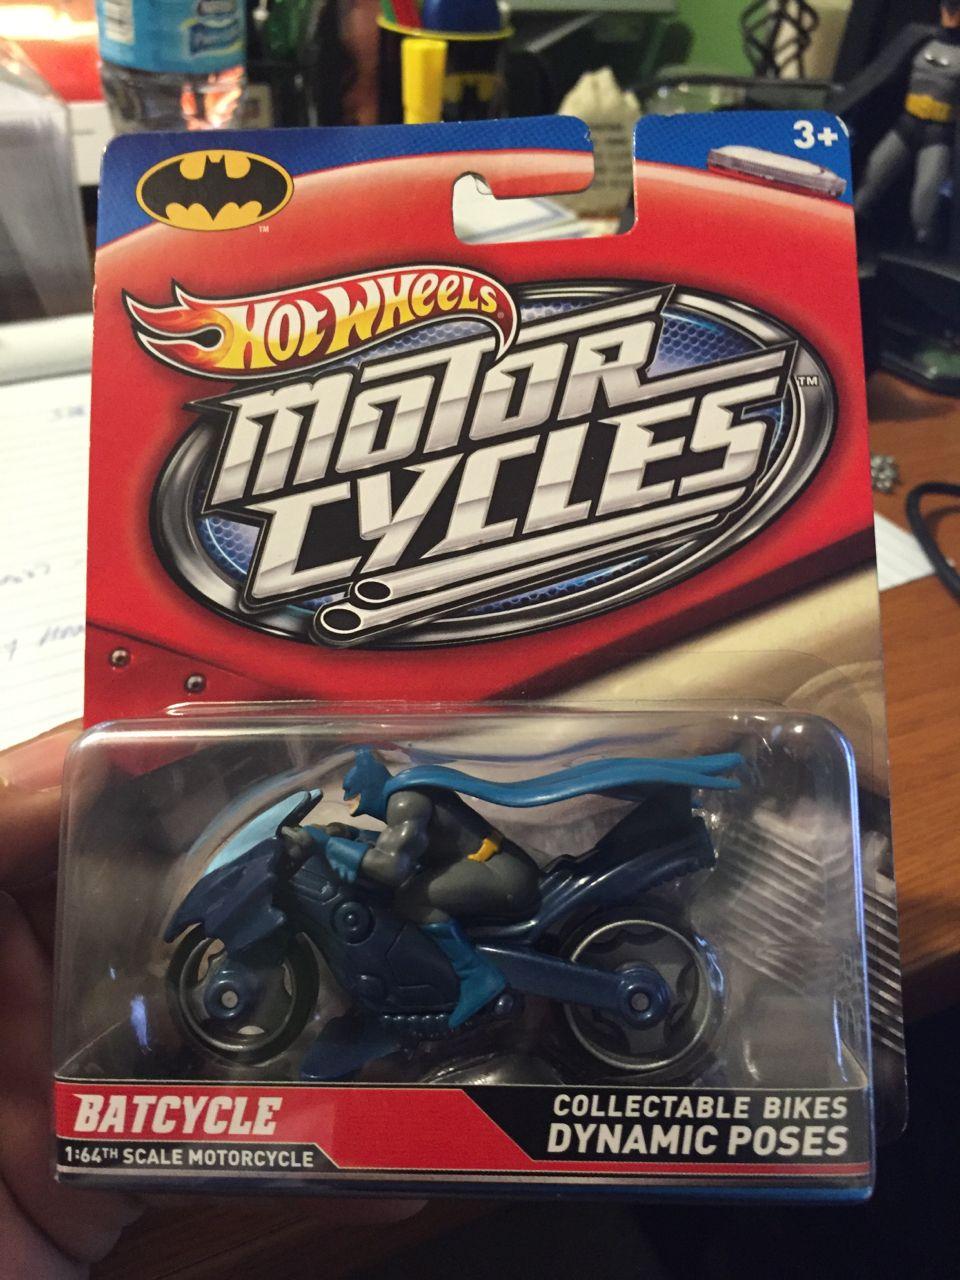 2012 Hotwheels Batcycle Motor Cycles With Figure Hot Wheels